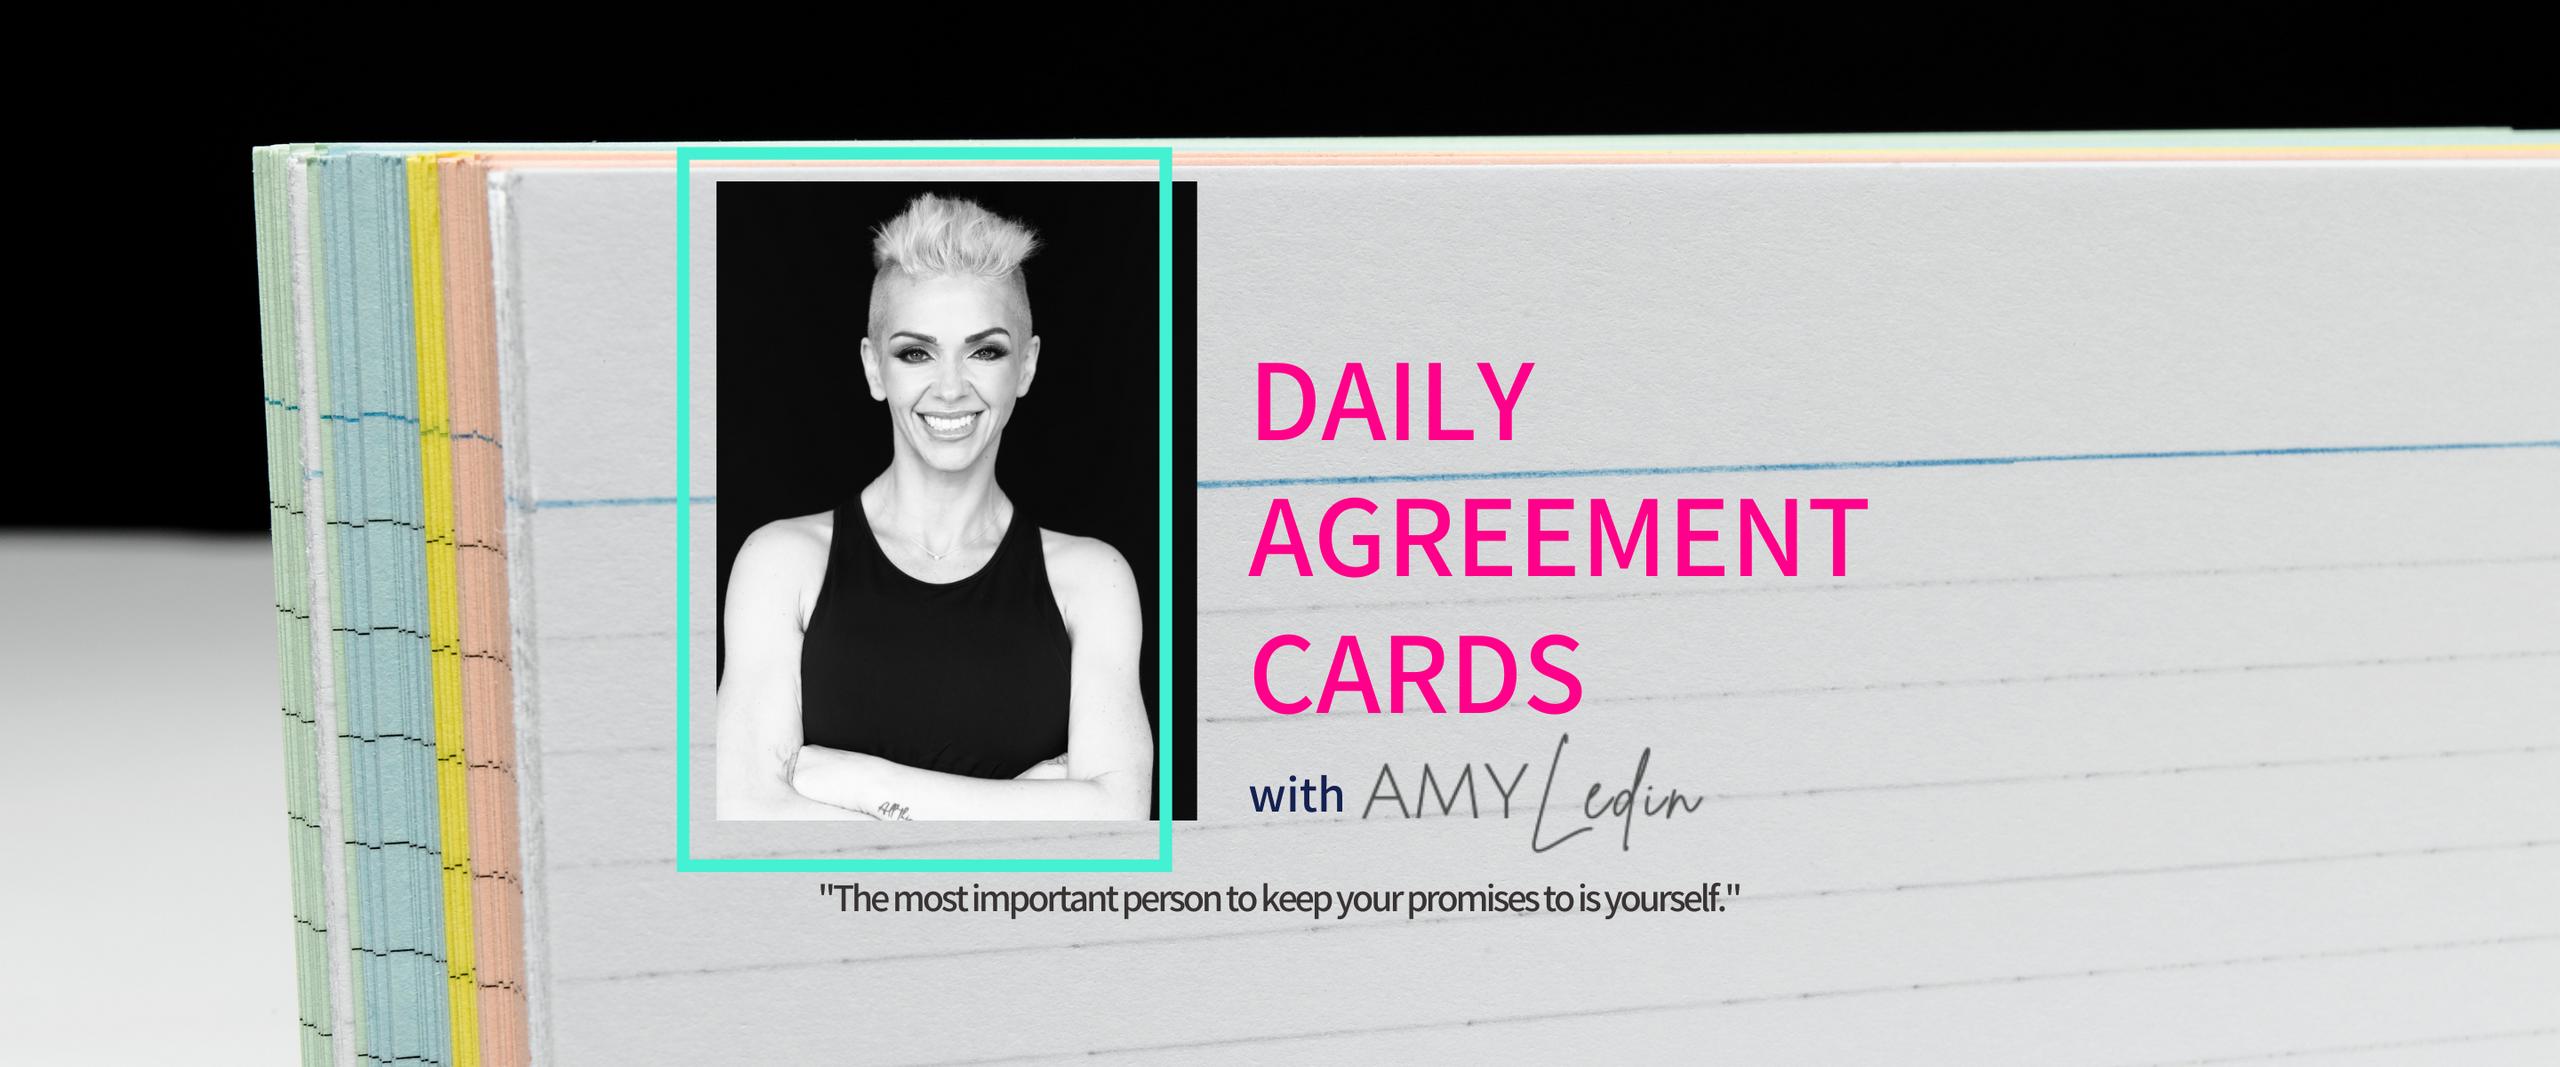 Daily Agreement Cards with Amy Ledin